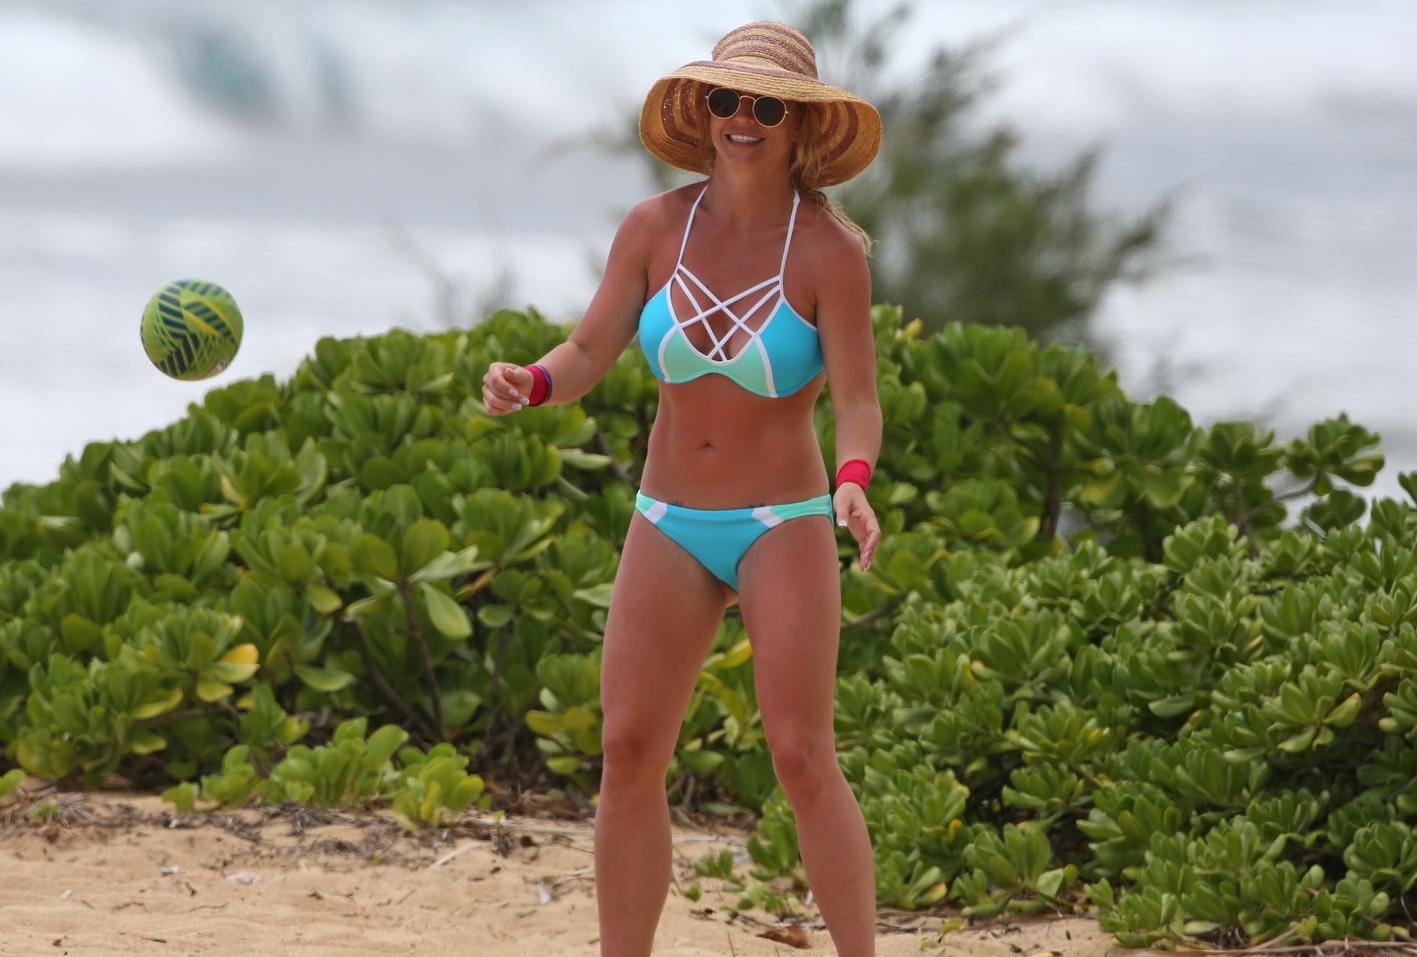 britney-spears-wearing-a-bikini-in-hawaii-34